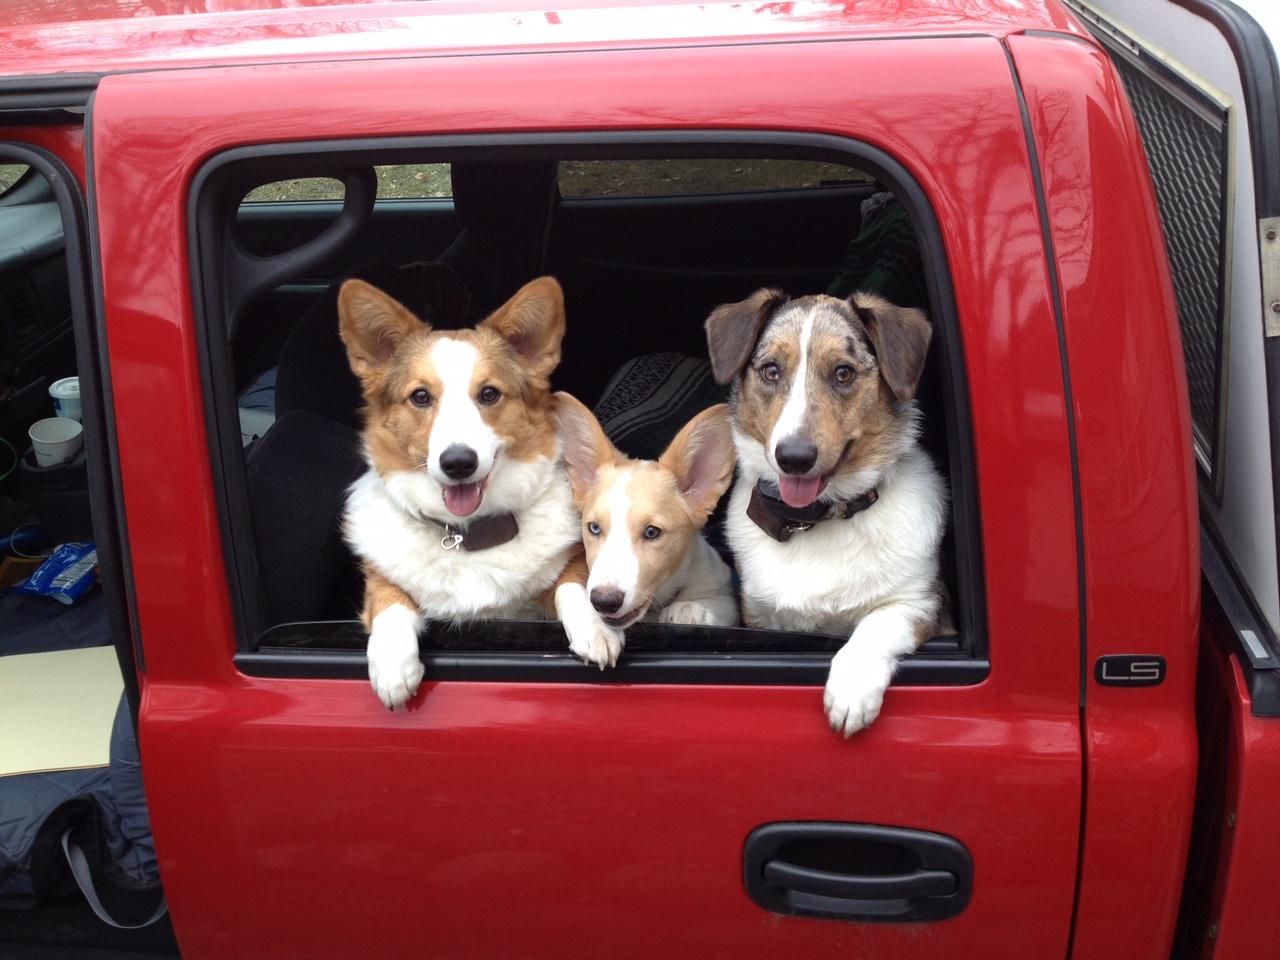 Ike, Iago and Hudson